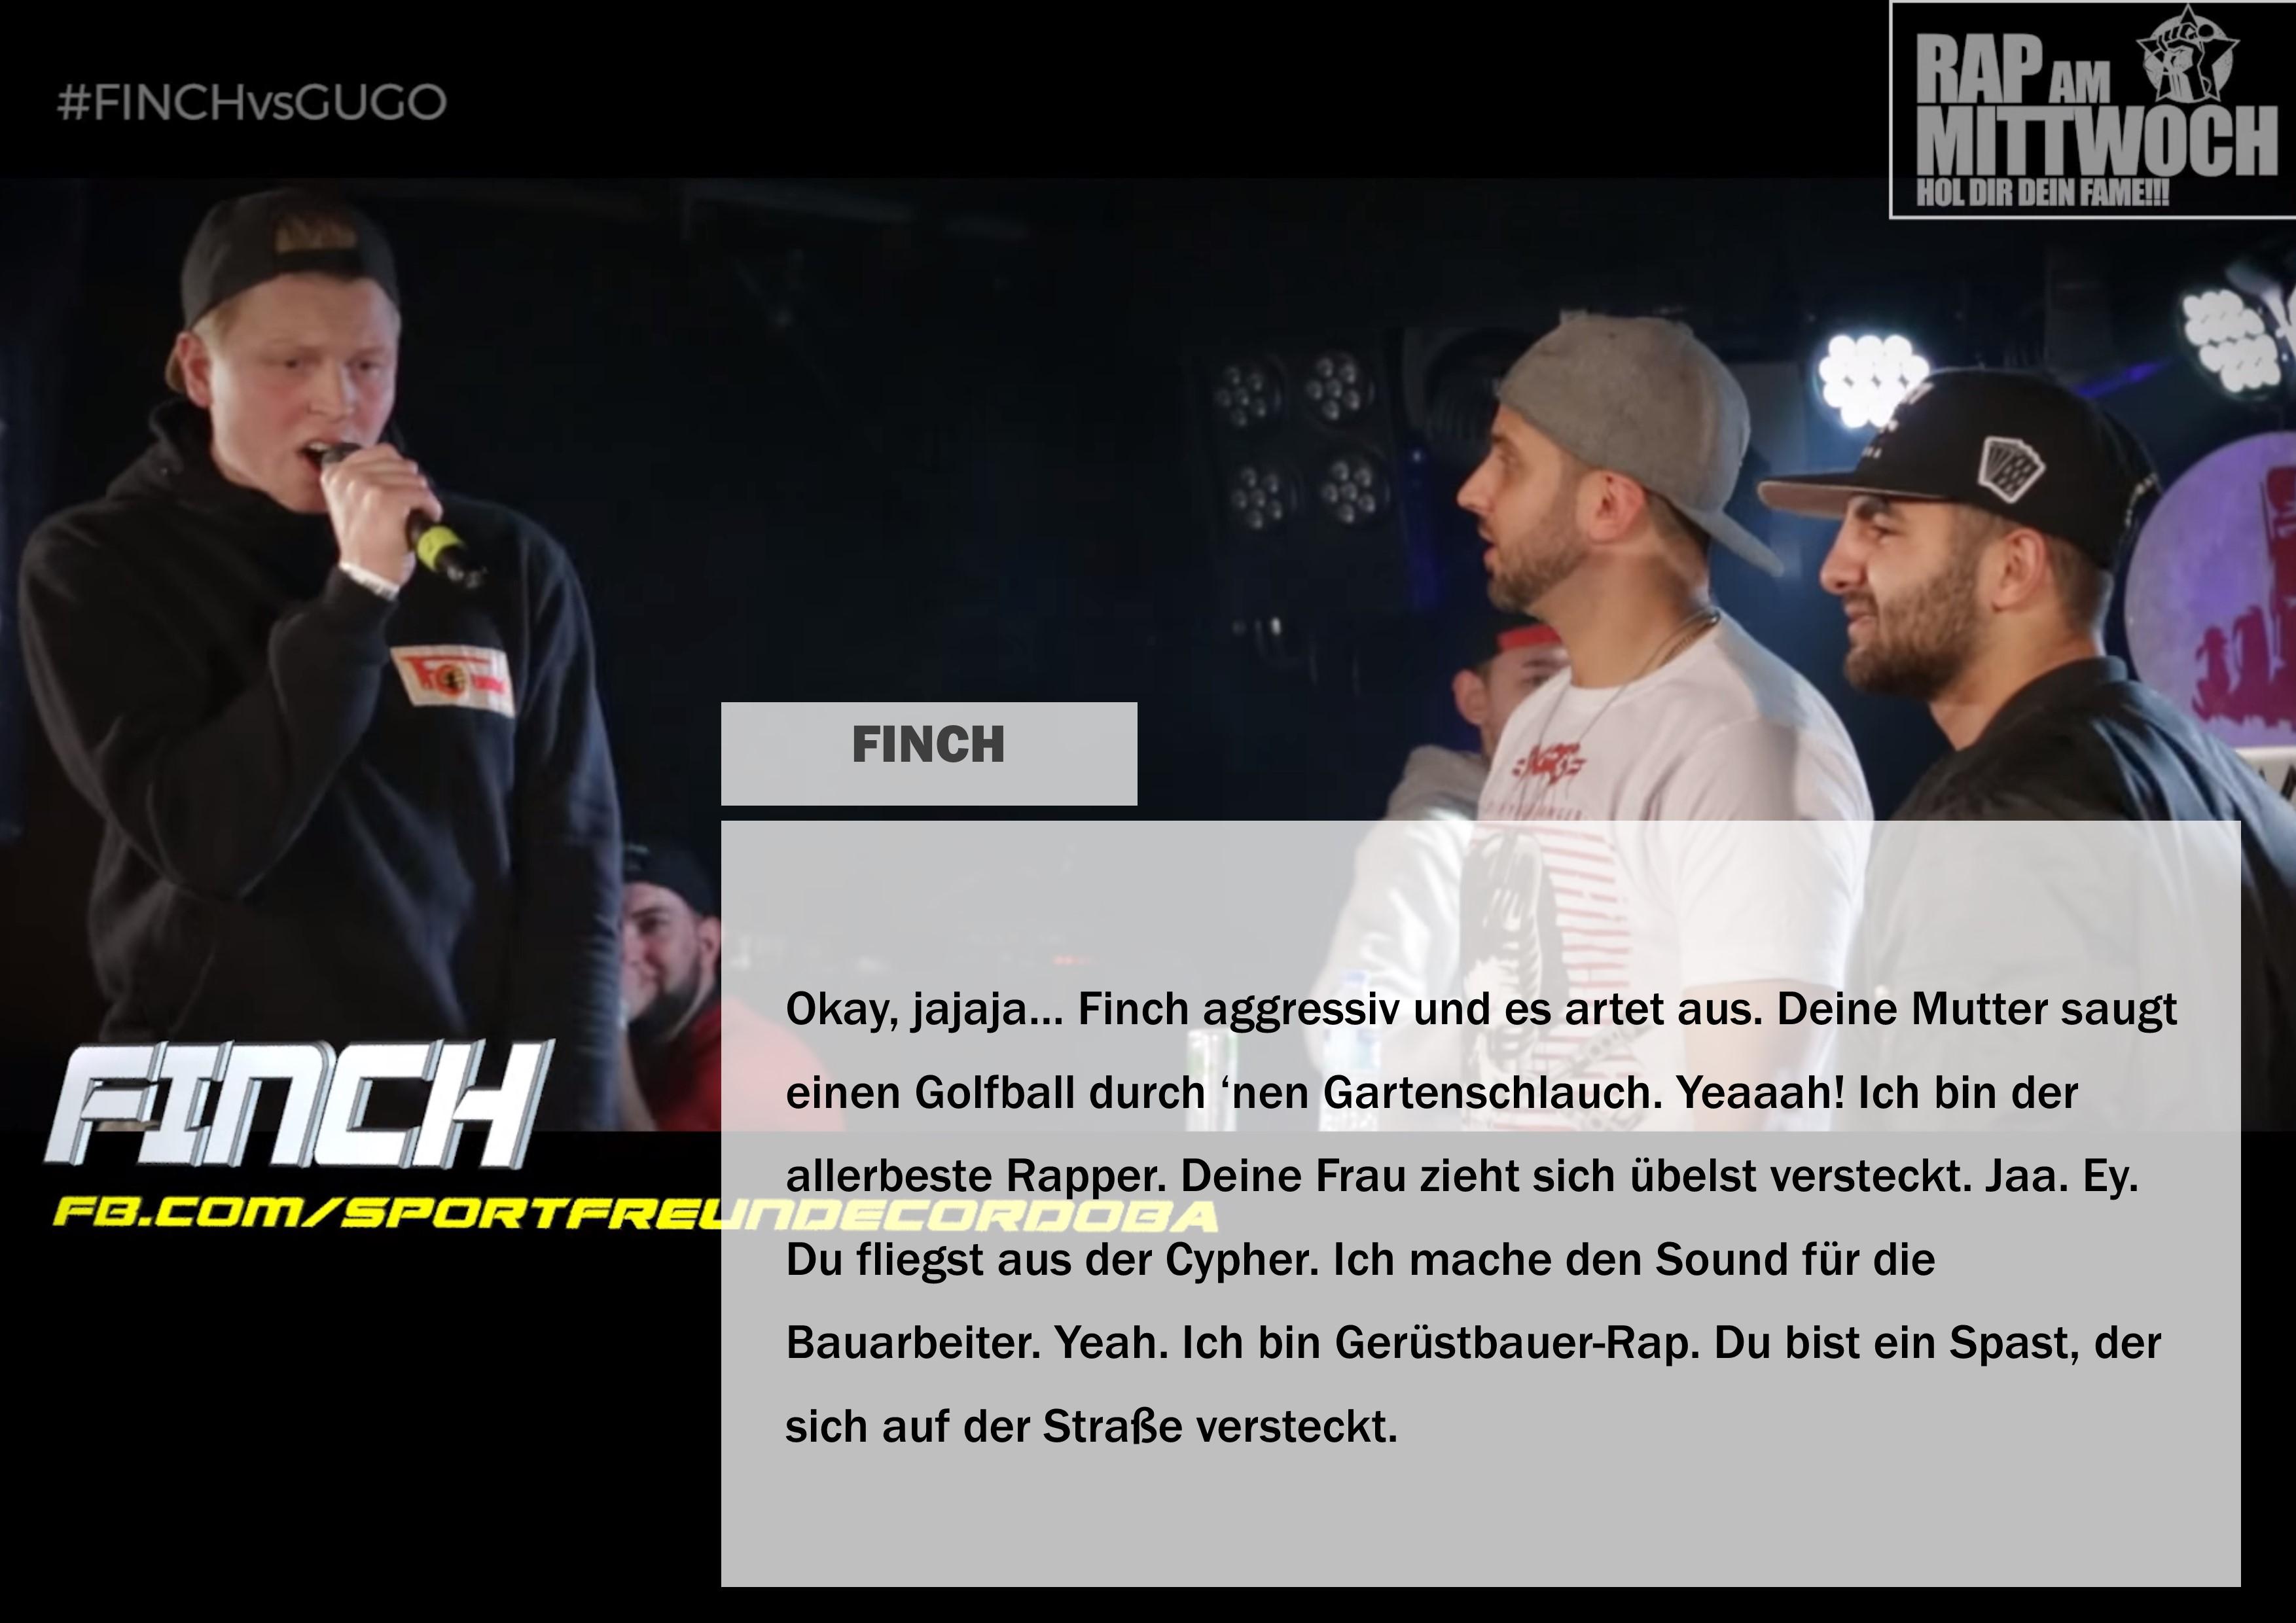 Gugo-vs-Finch-6-1